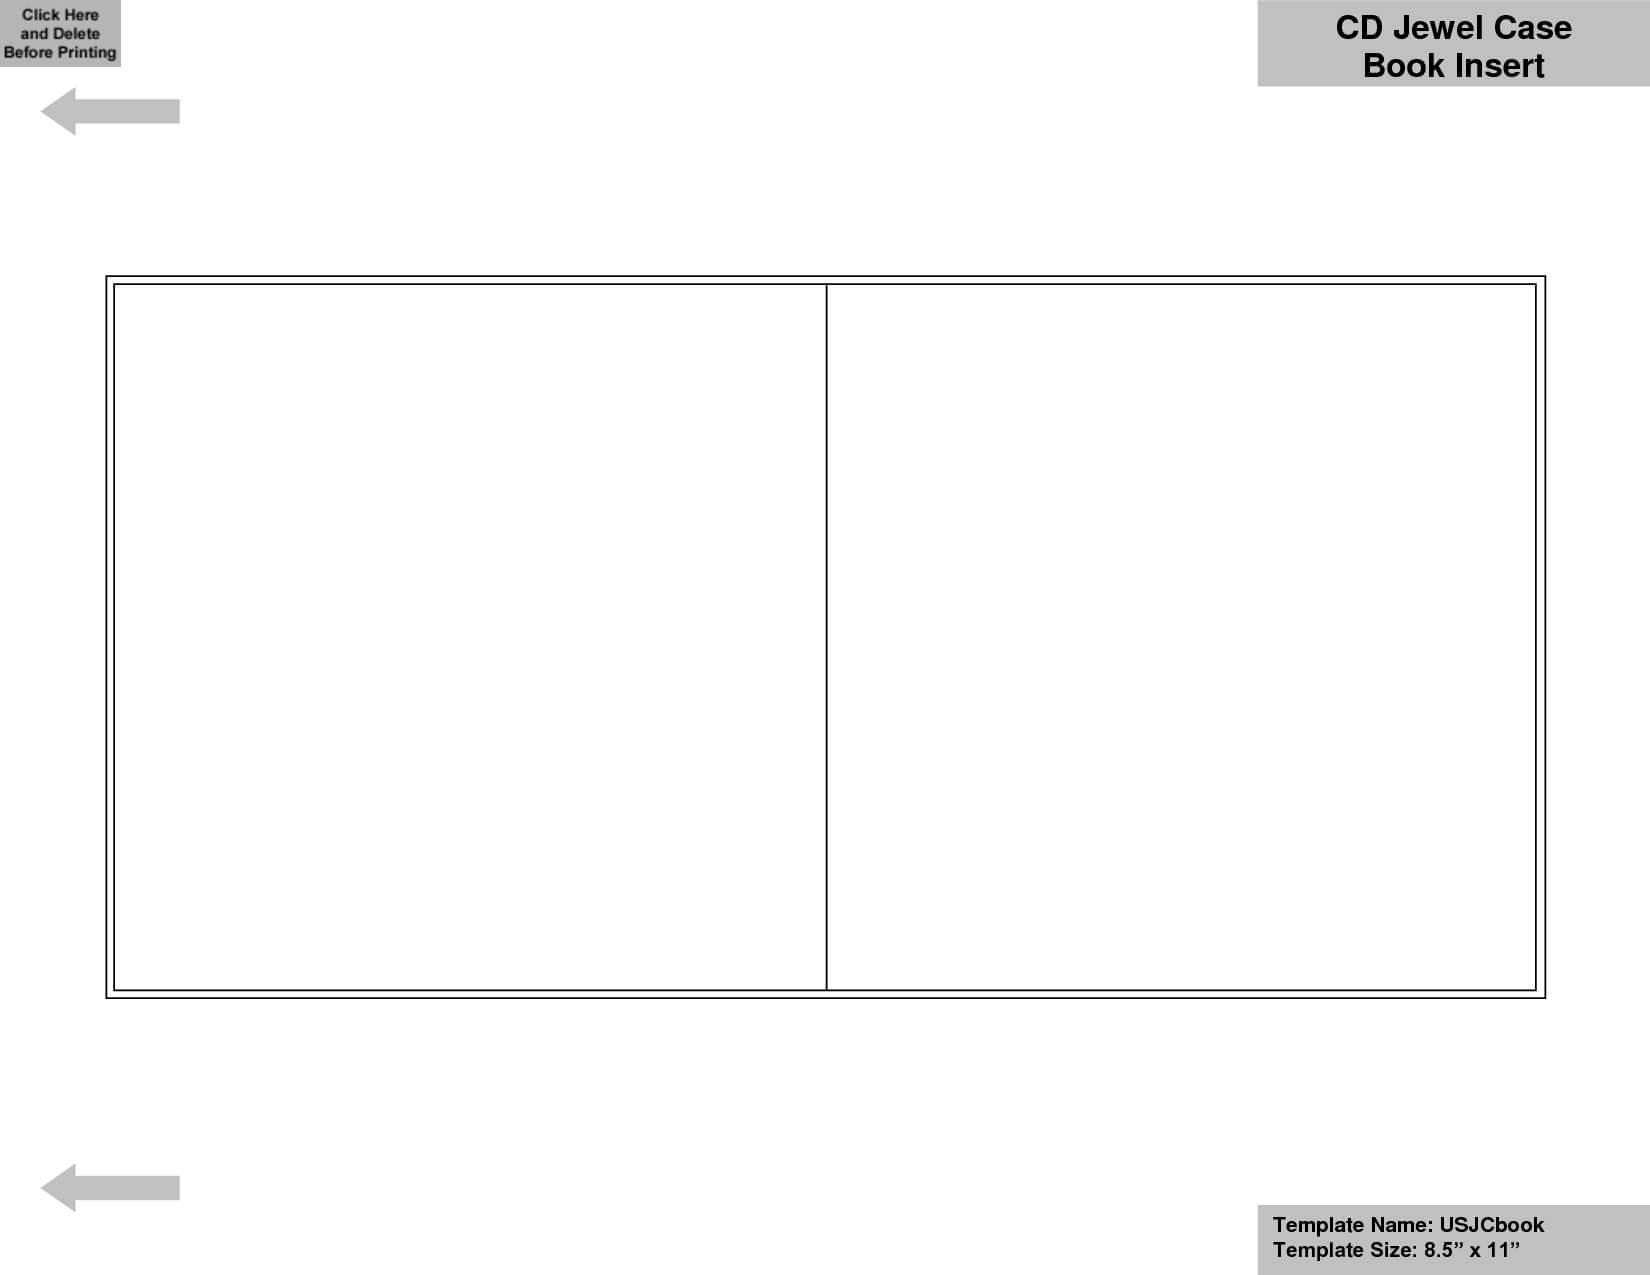 016 Template Ideas Printable Sleeve Case Insert Luxury Blank In Blank Cd Template Word